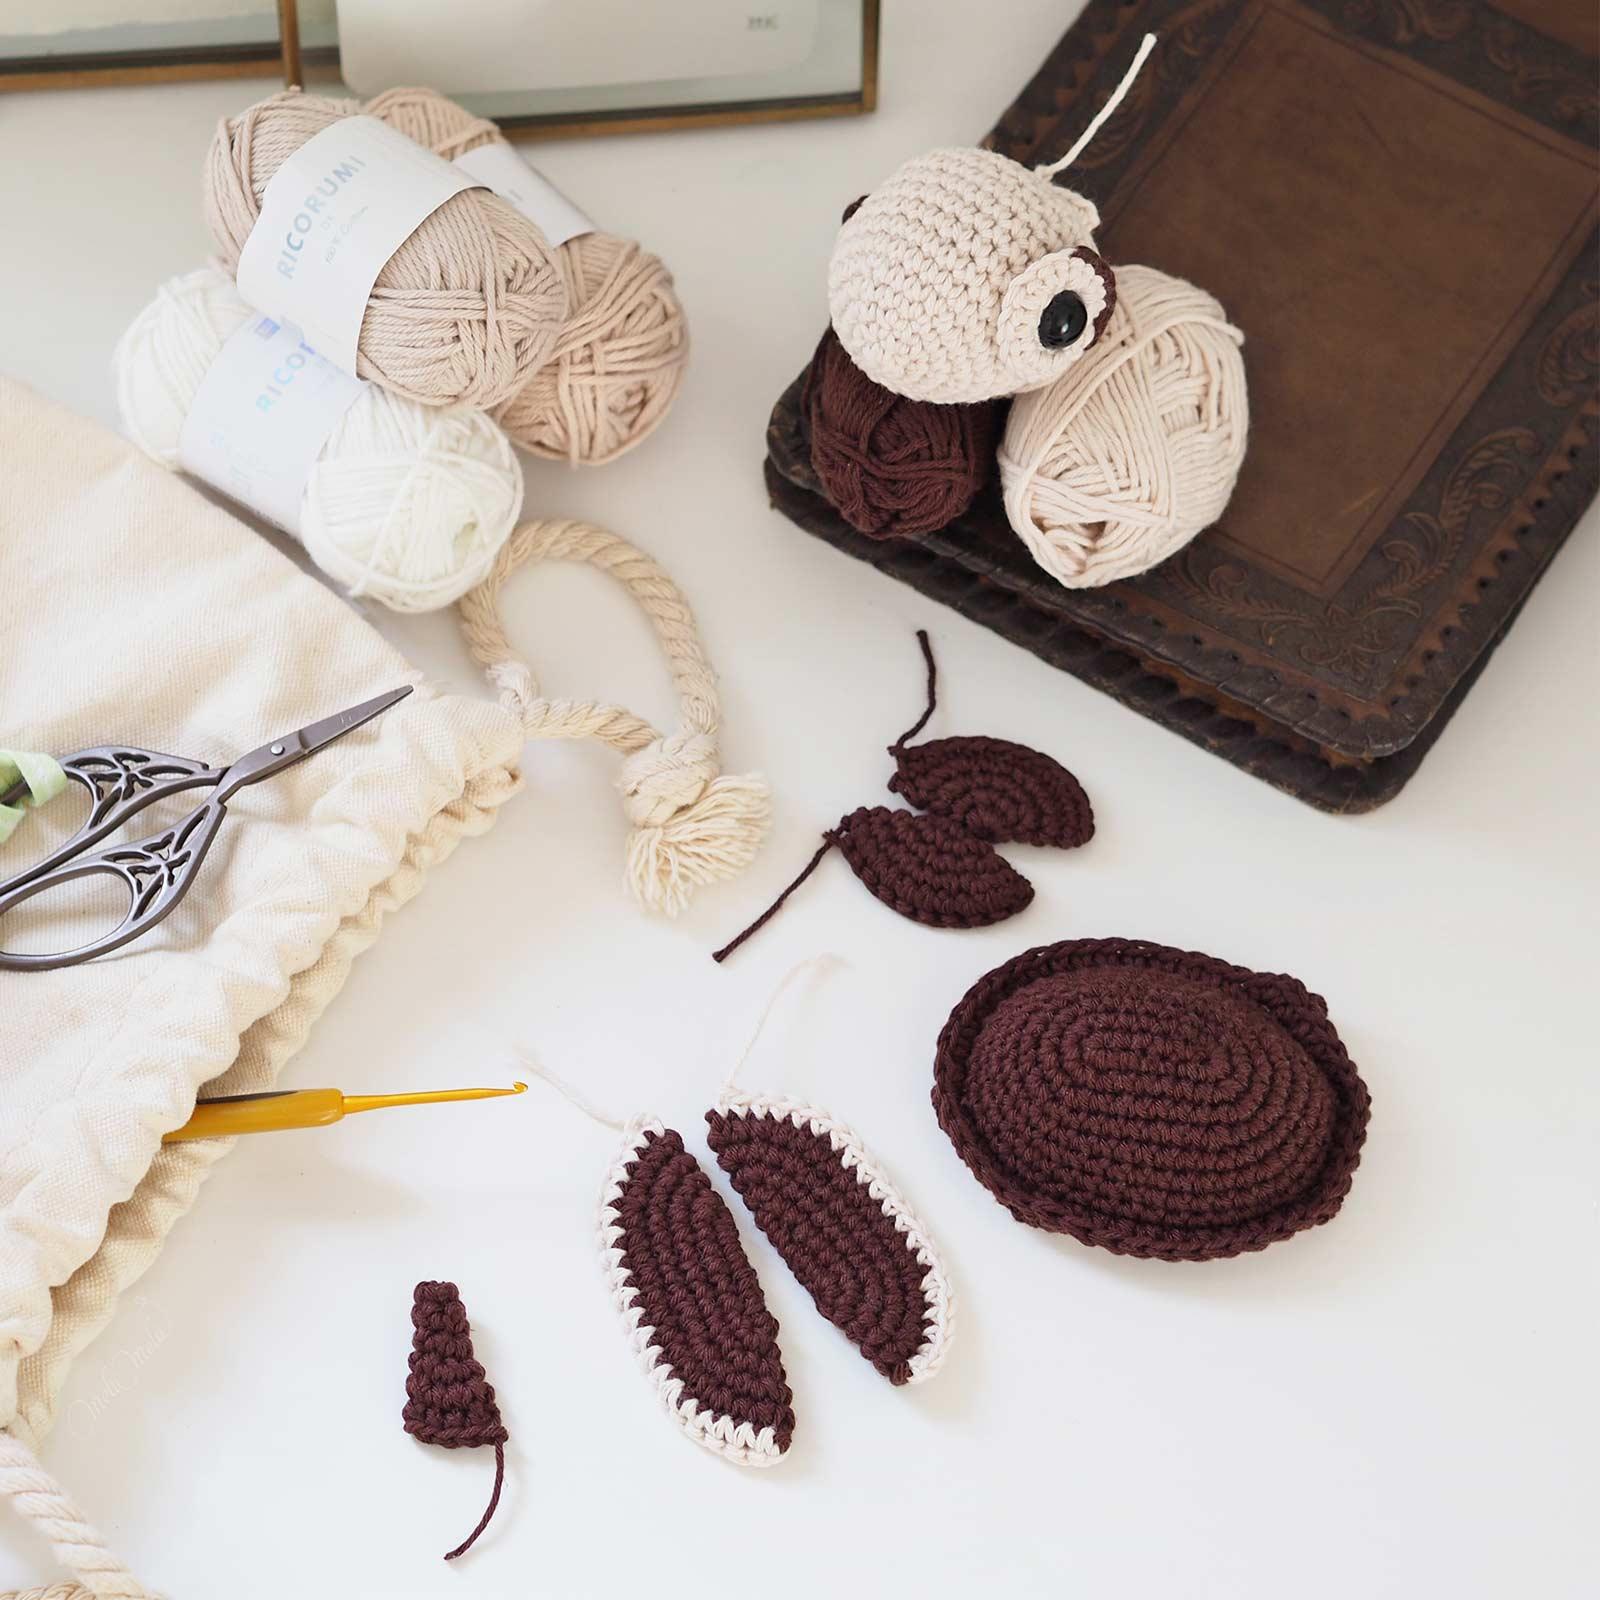 crochet-encours-tortue-amigurumiwildlife-ricorumi-coton-laboutiquedemelimelo